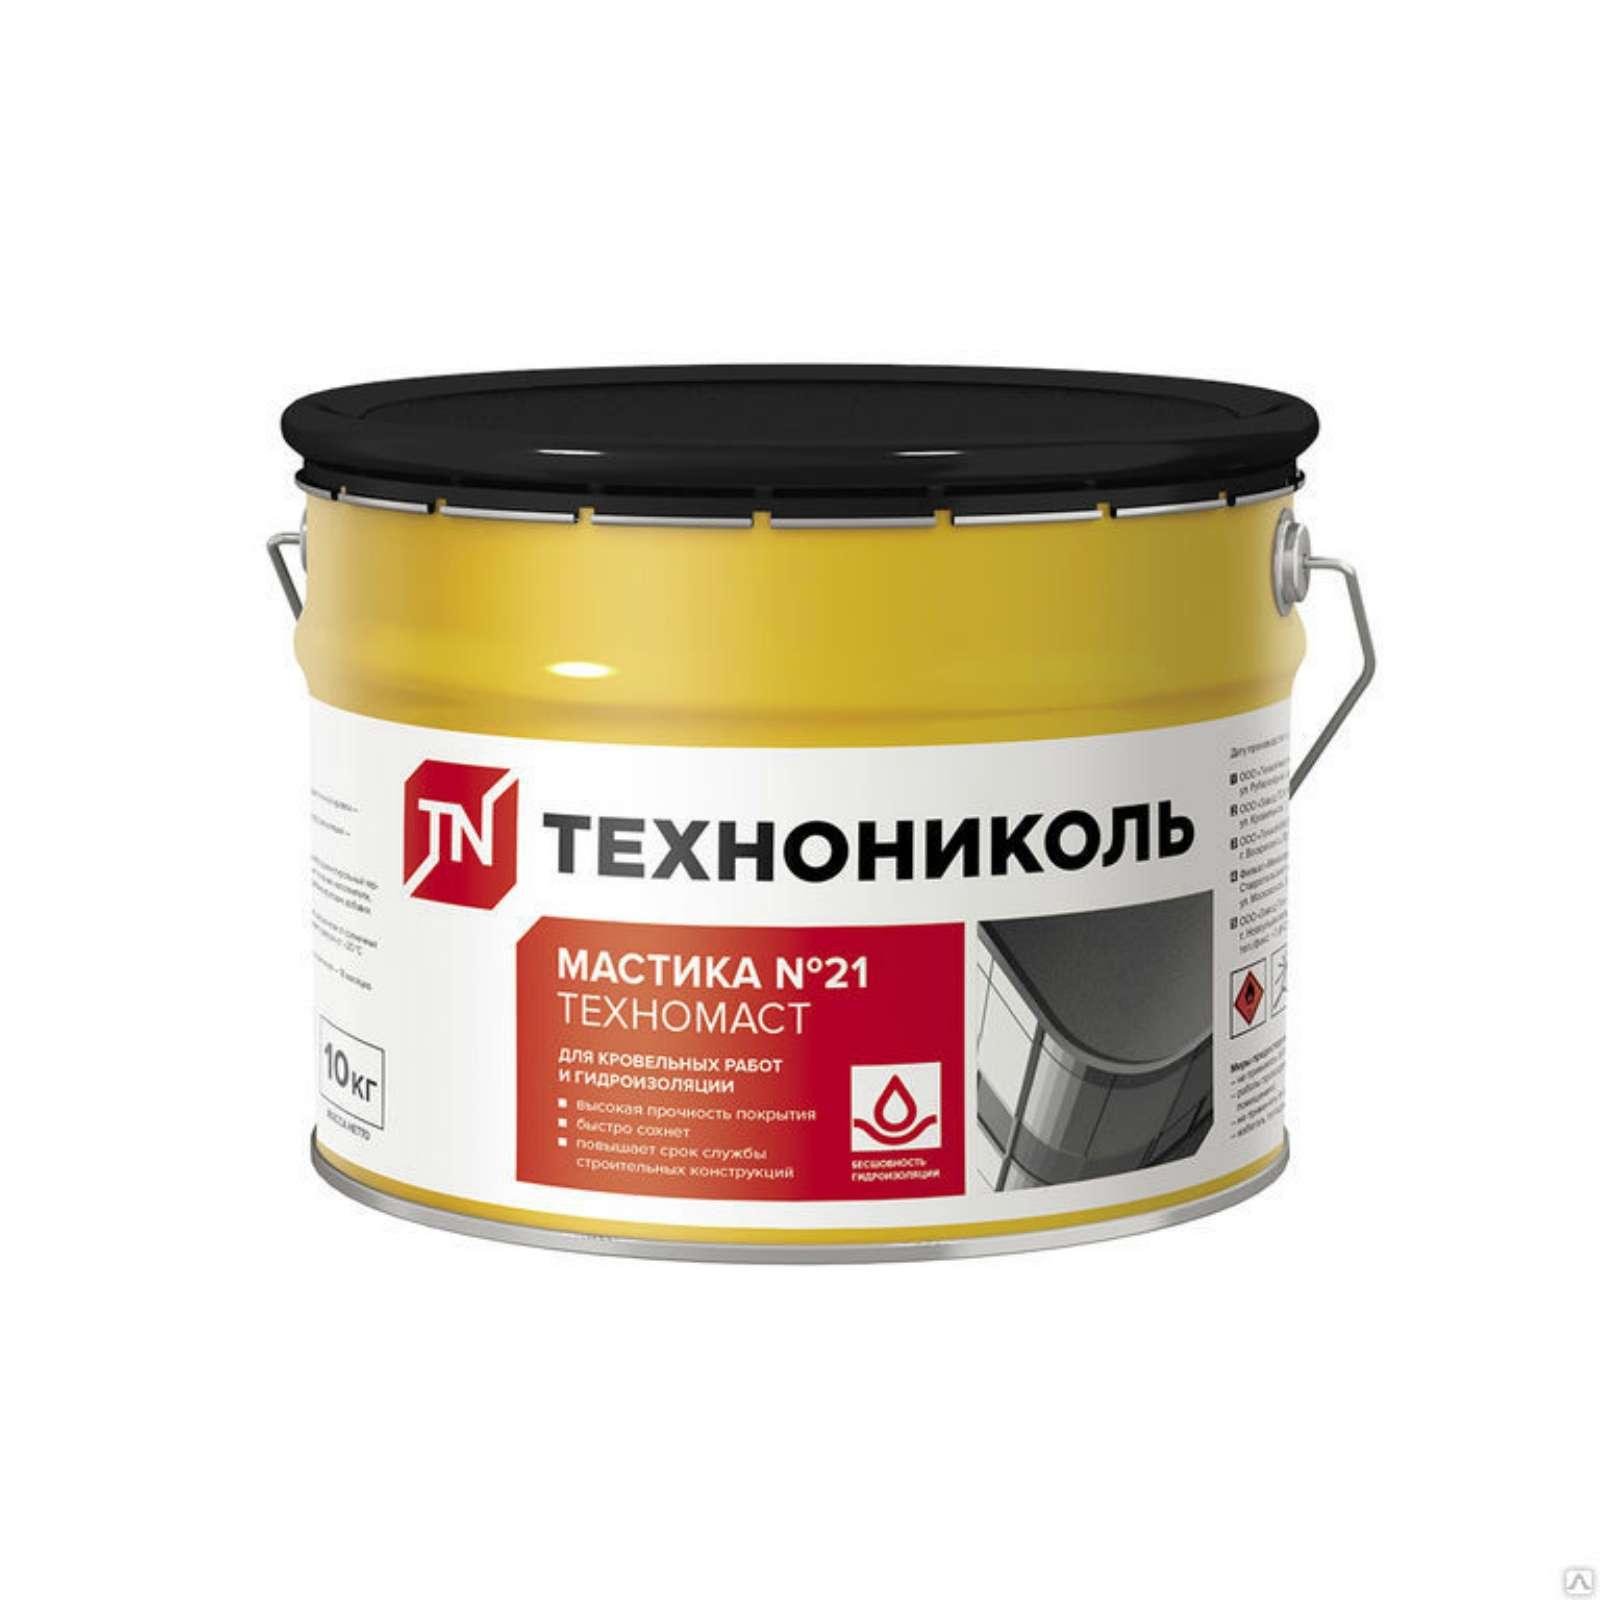 Мастика битумно-полимерная, марка техномаст hfc jl терморасширяющаяся мастика мто